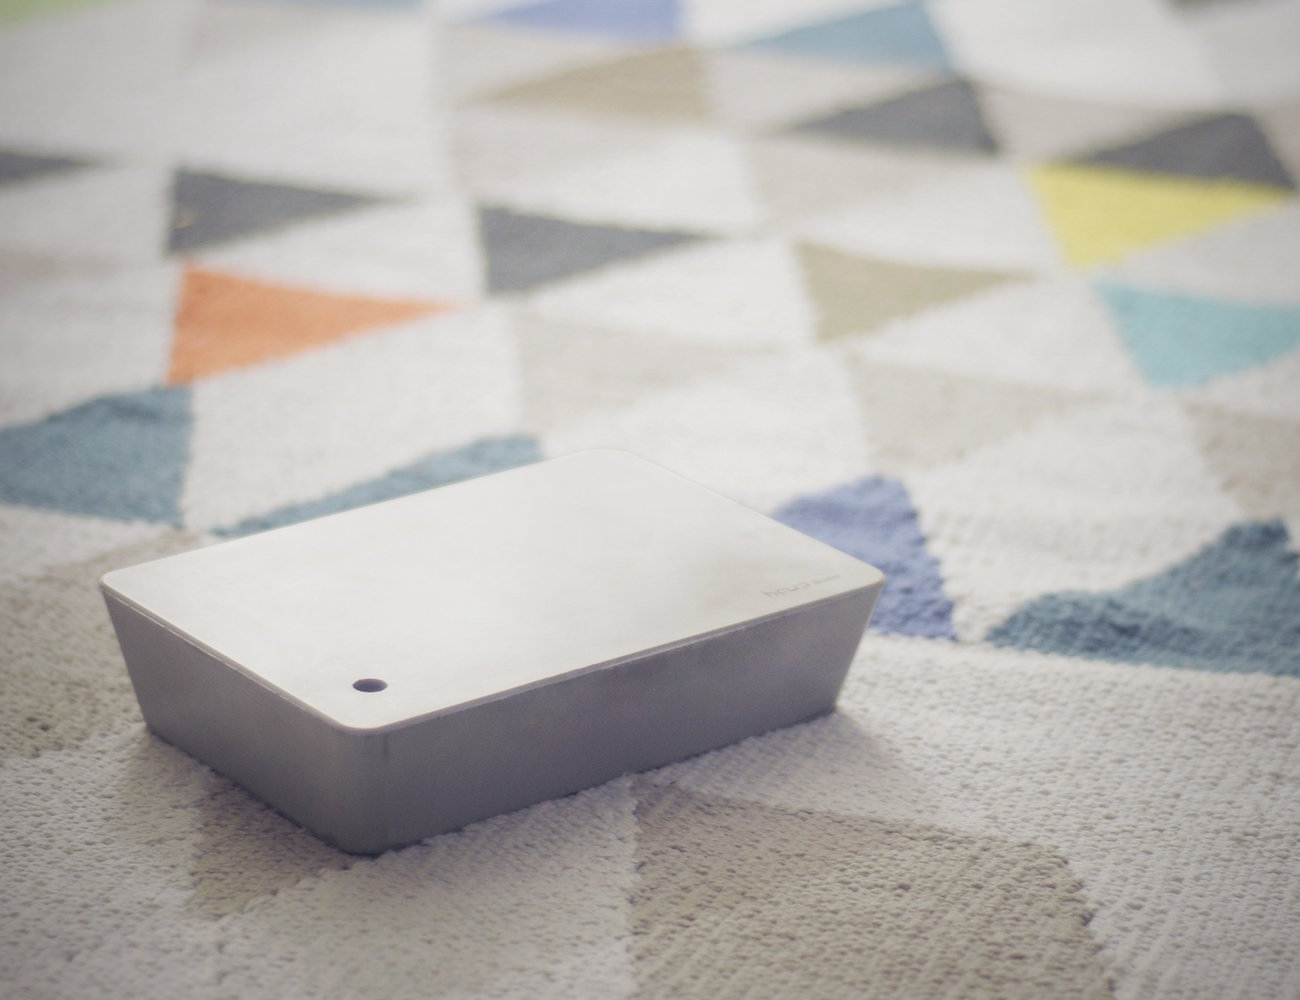 Concrete Brick Lamp – Portable LED Lamp from HCWD Studio